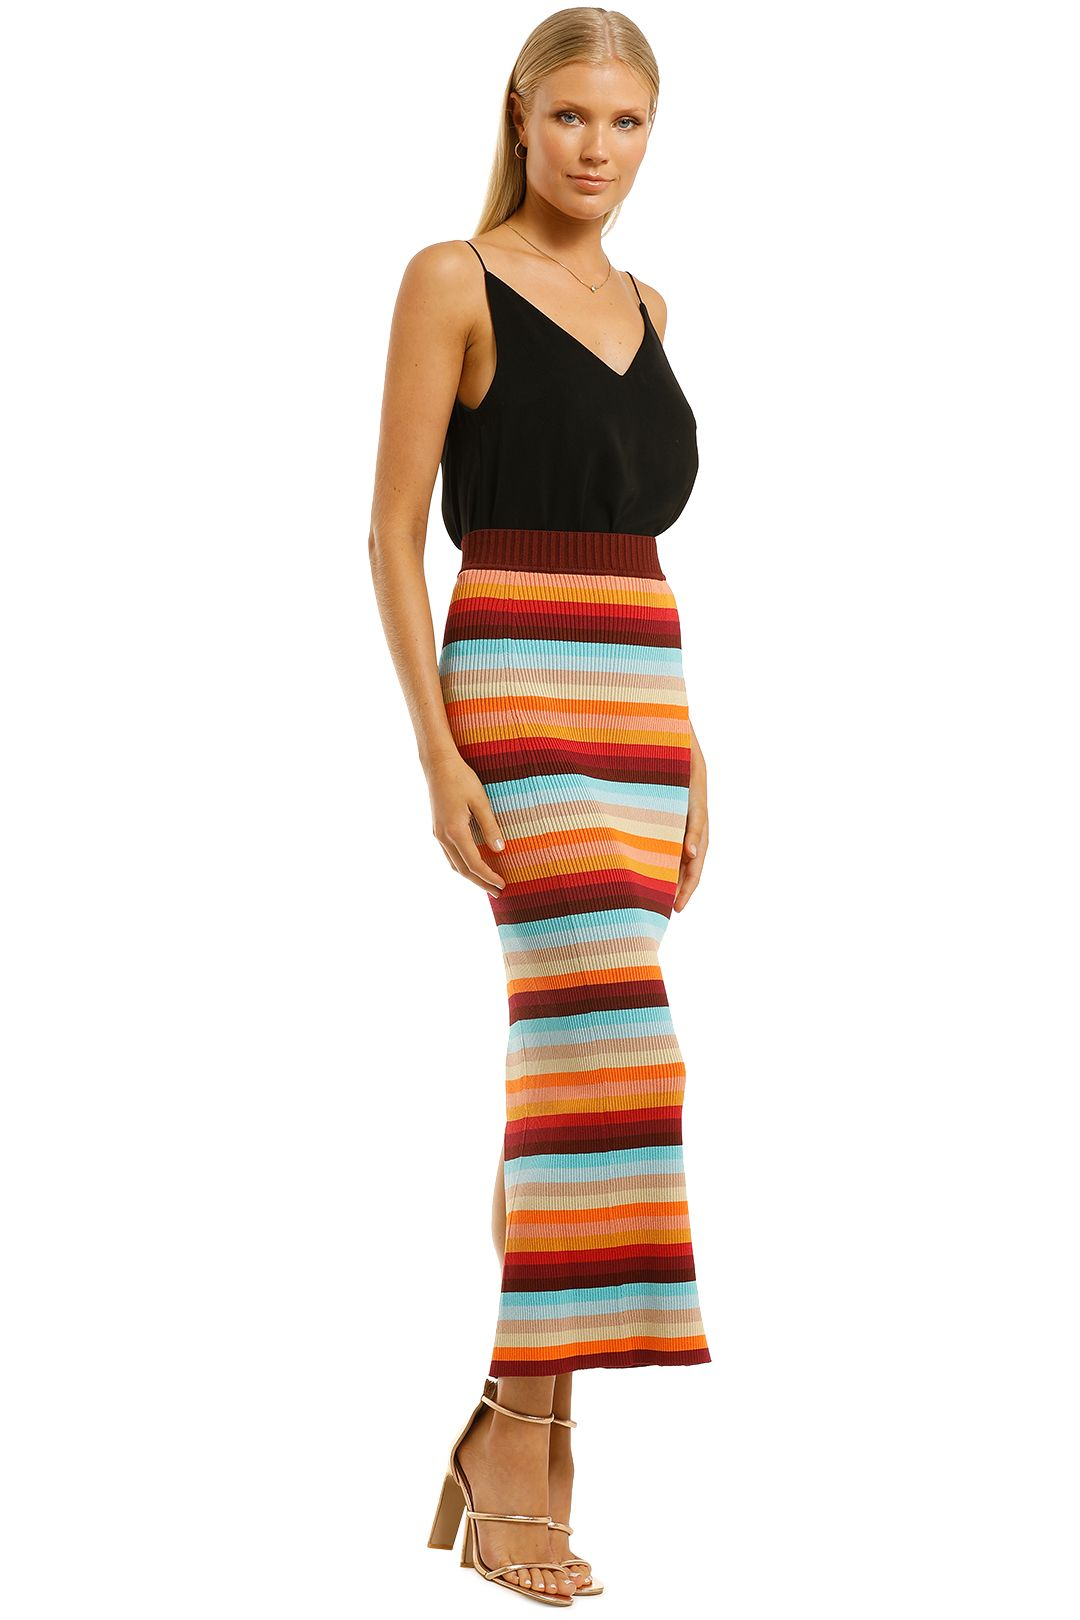 Scanlan-Theodore-Crepe-Knit-Stripe-Skirt-Sunset-Side